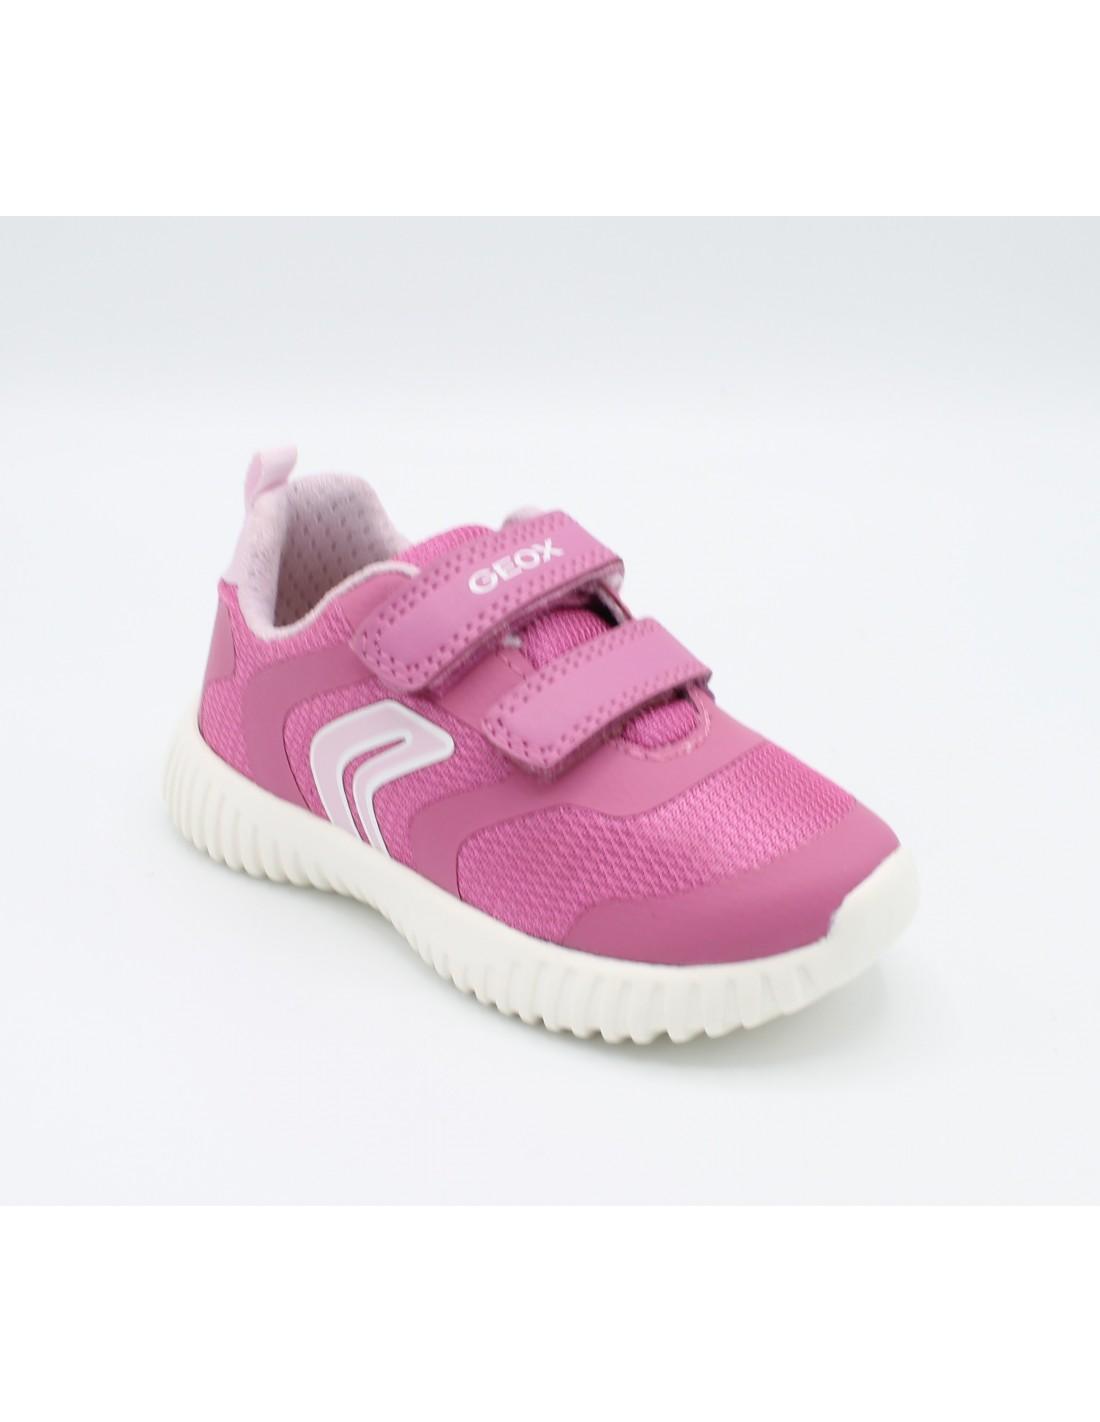 Dettagli su Geox Scarpe per Bambina Estive Sneakers da Bimba in Tela Sportive Ginnastica 26